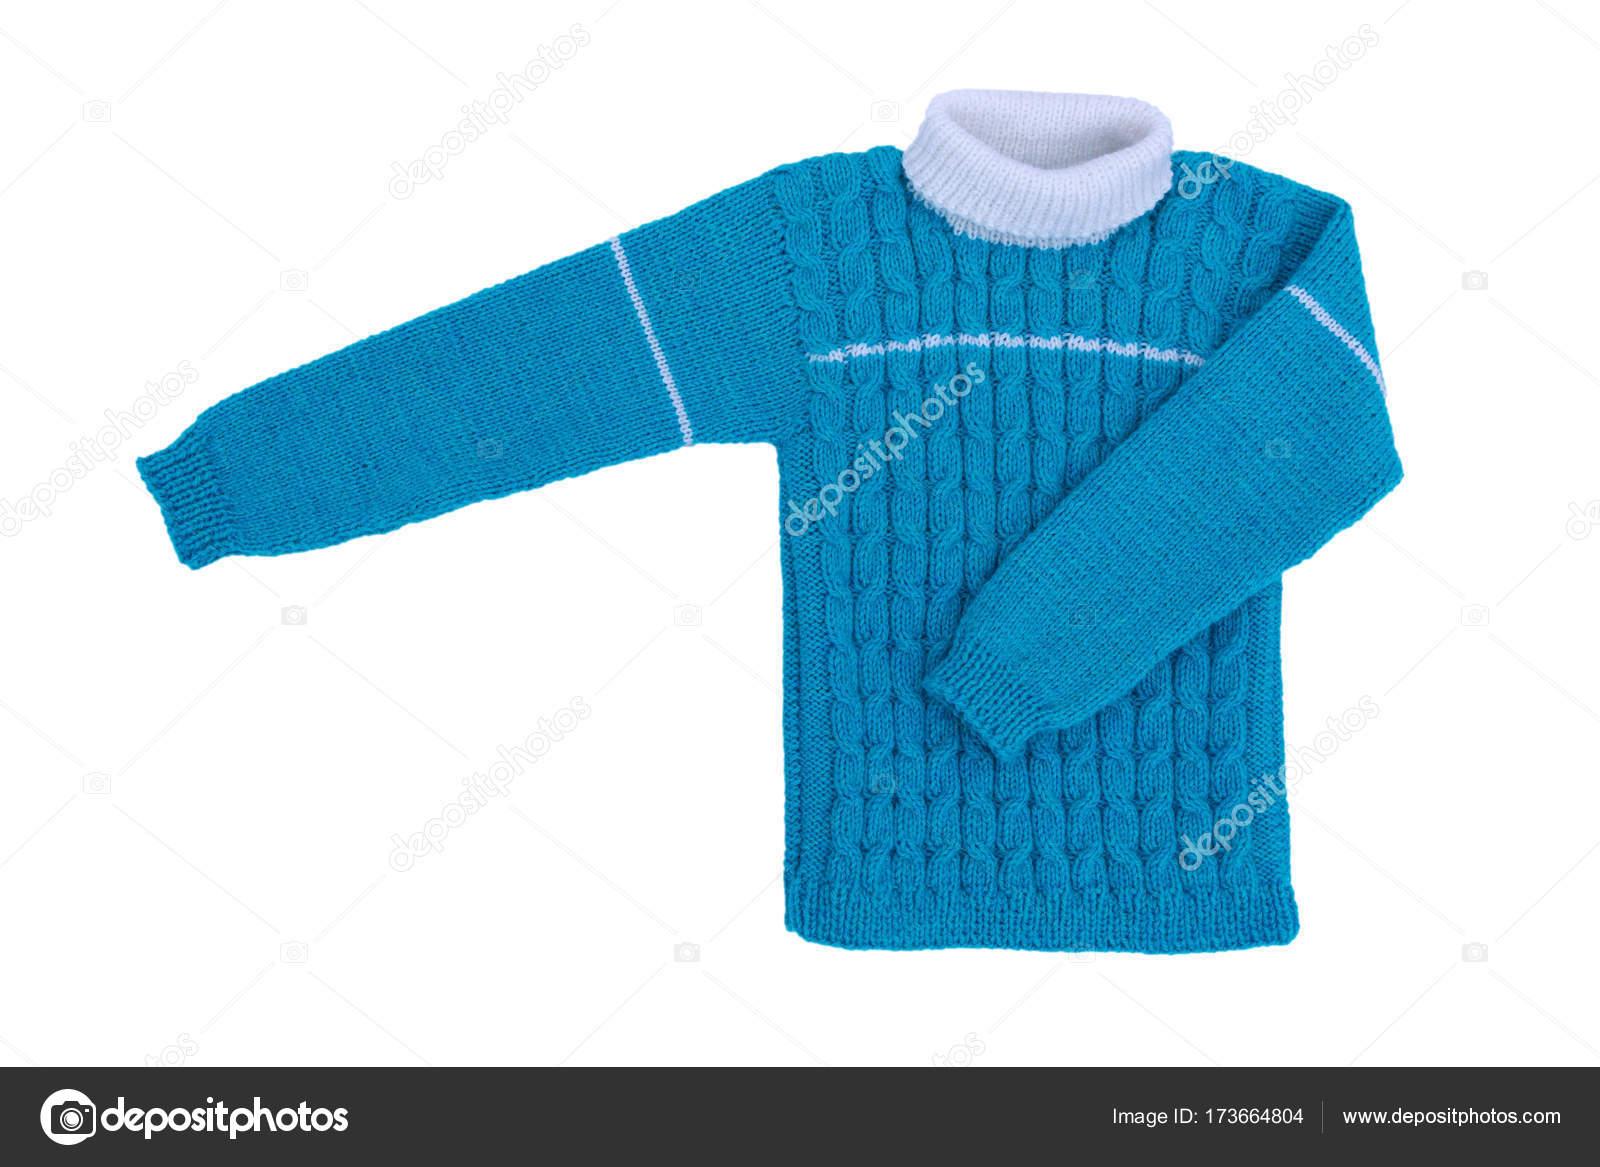 29c84b30e4a9 Πουλόβερ πλεκτό παιδιά απομονωθεί σε λευκό φόντο. Ζεστό μπλε πλεκτό πουλόβερ  με ένα μοτίβο — Εικόνα από ...